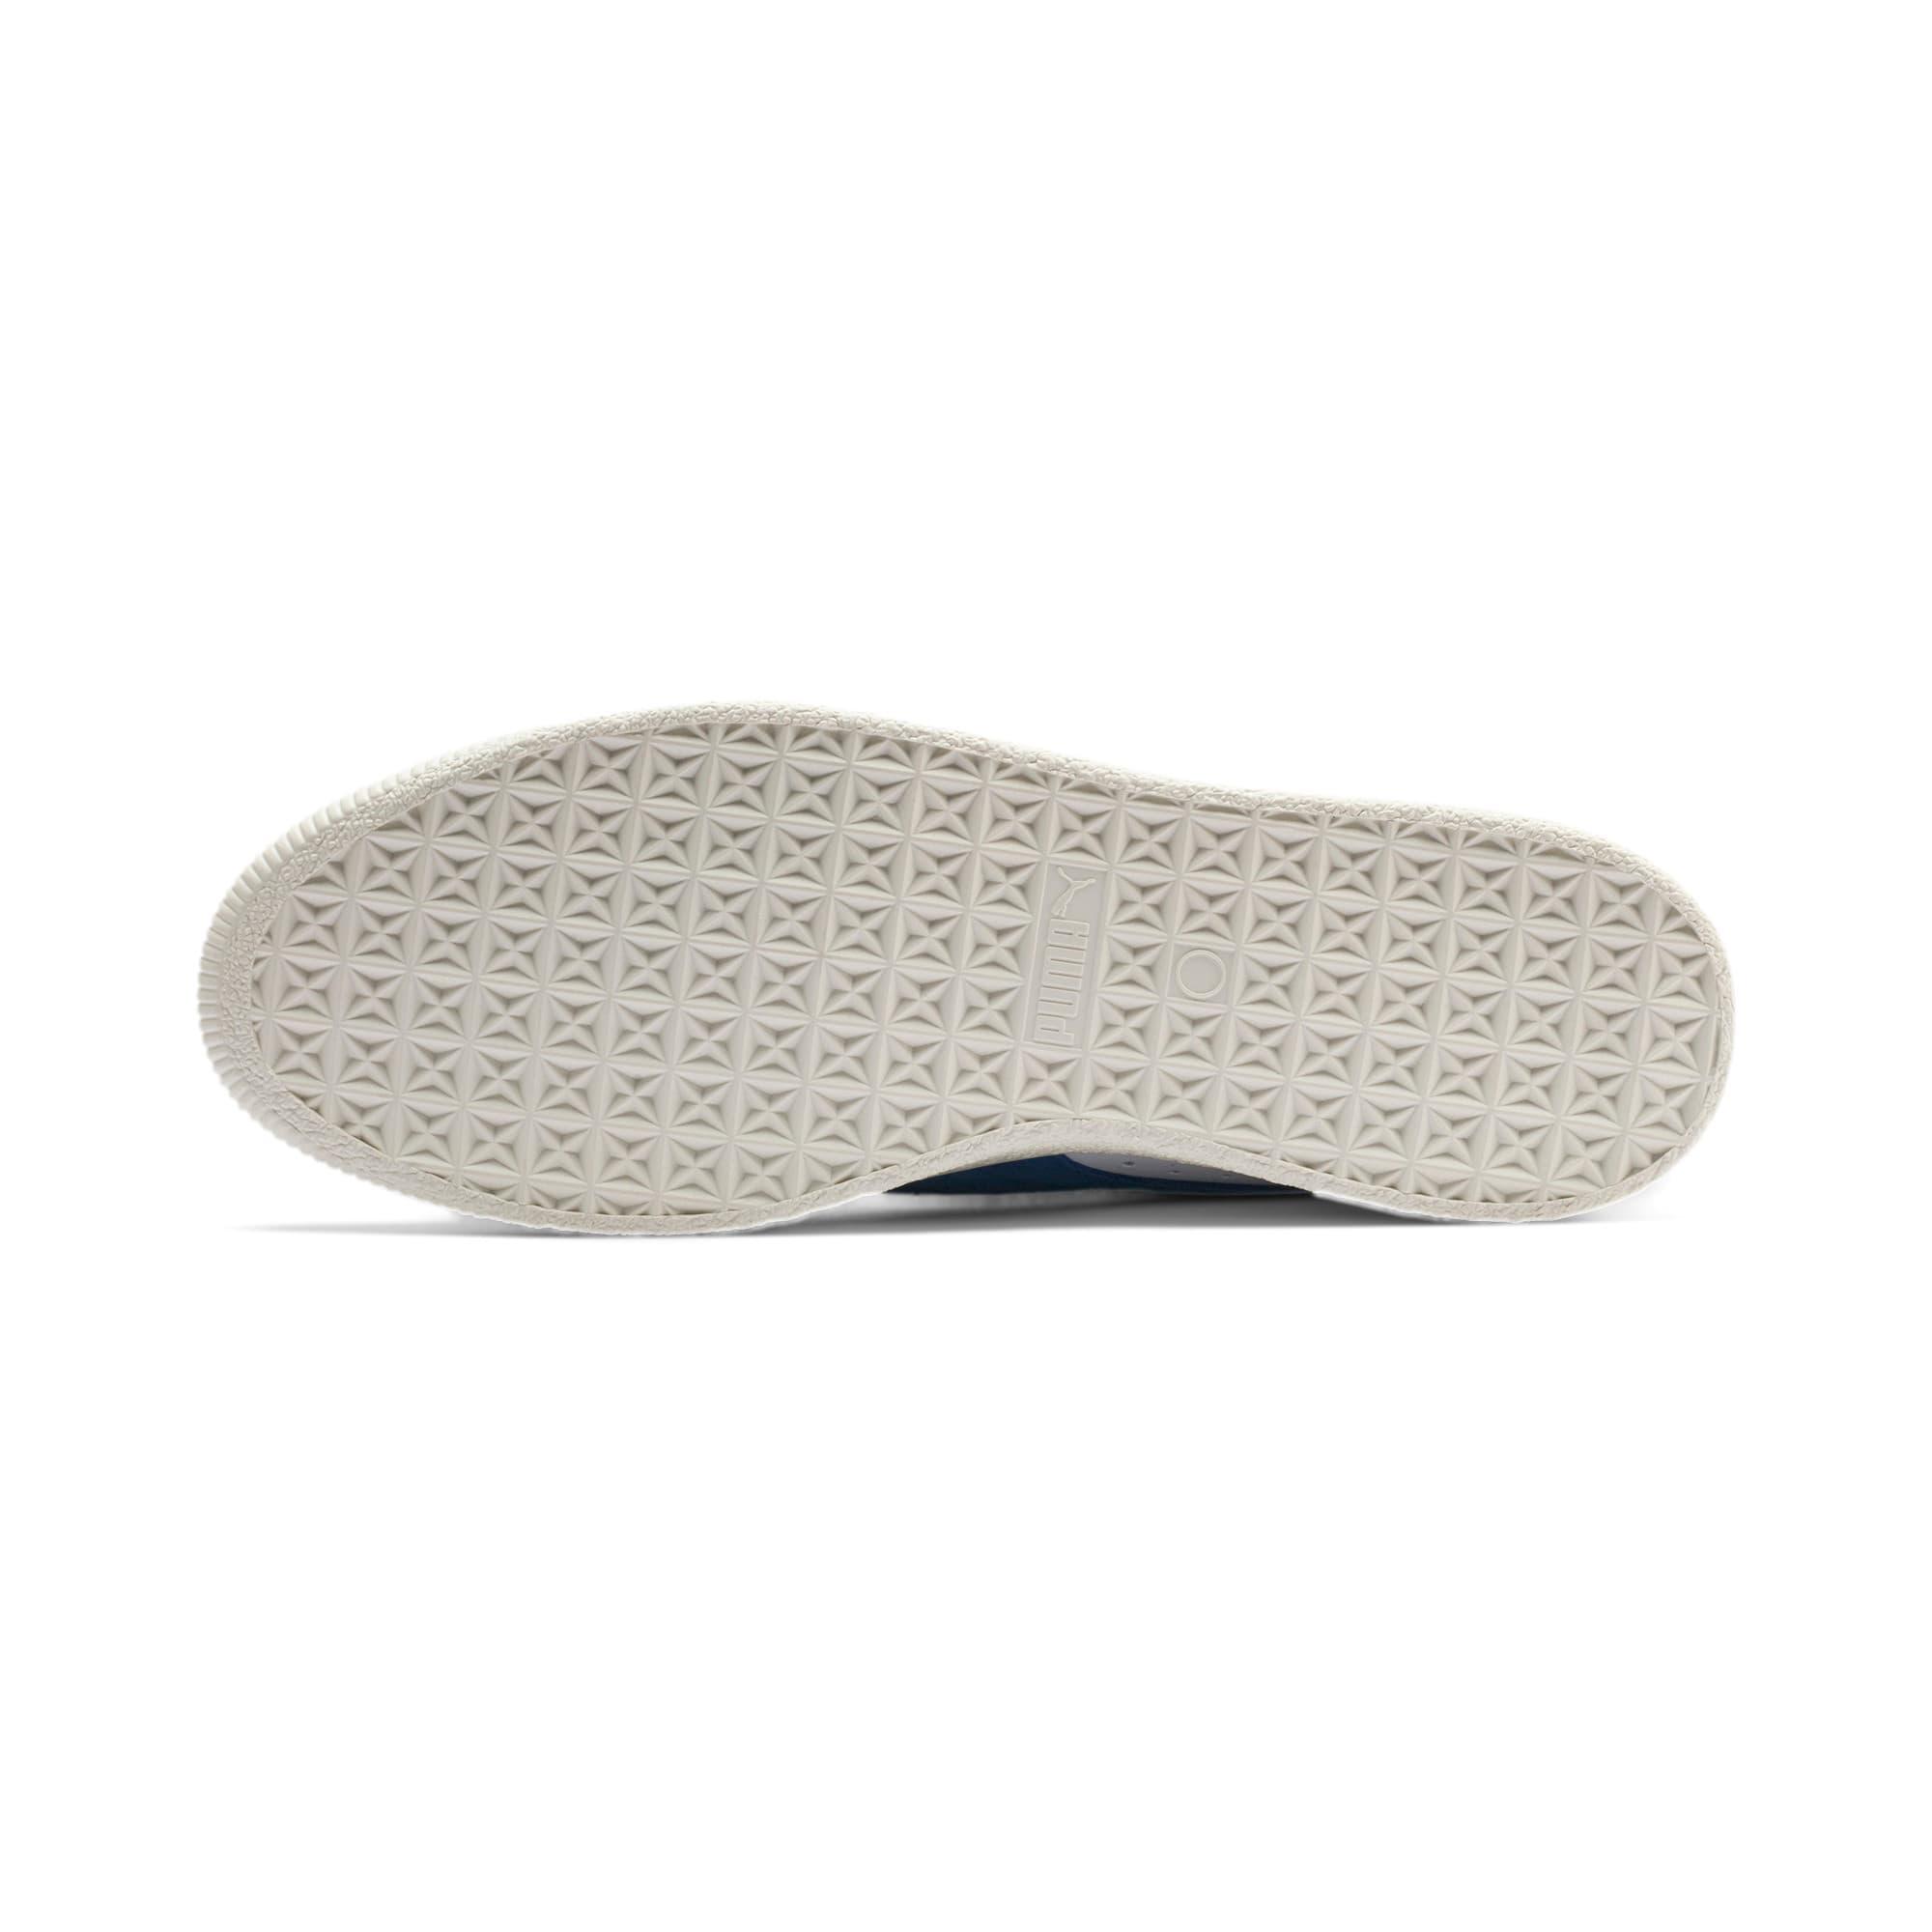 Thumbnail 5 of Basket 90680 Sneakers, Puma White-Galaxy Blue-Whisp, medium